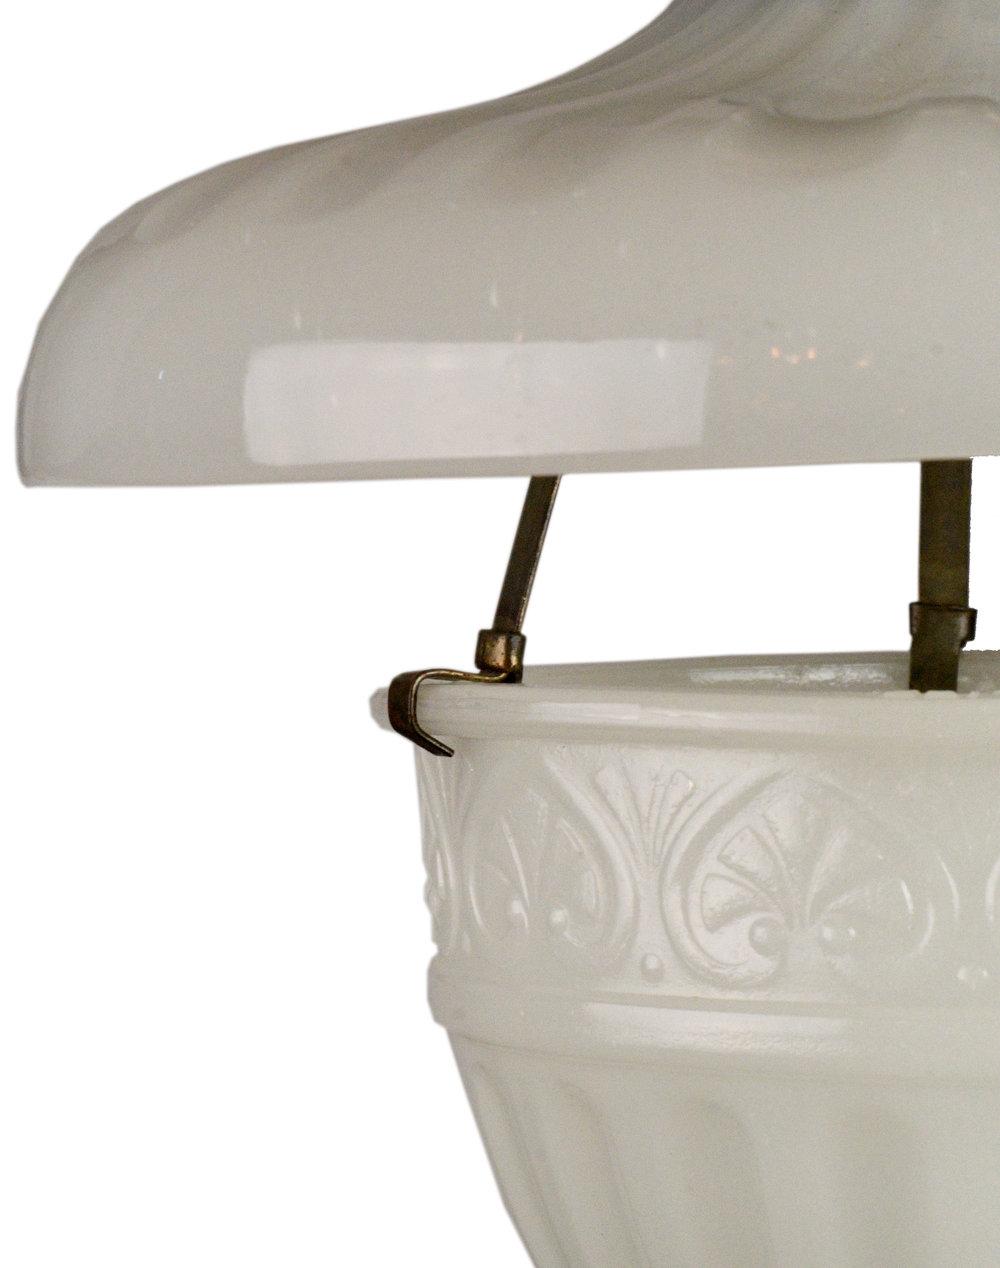 47776-Peerlite-Flushmount-with-milkglass-shade.jpg